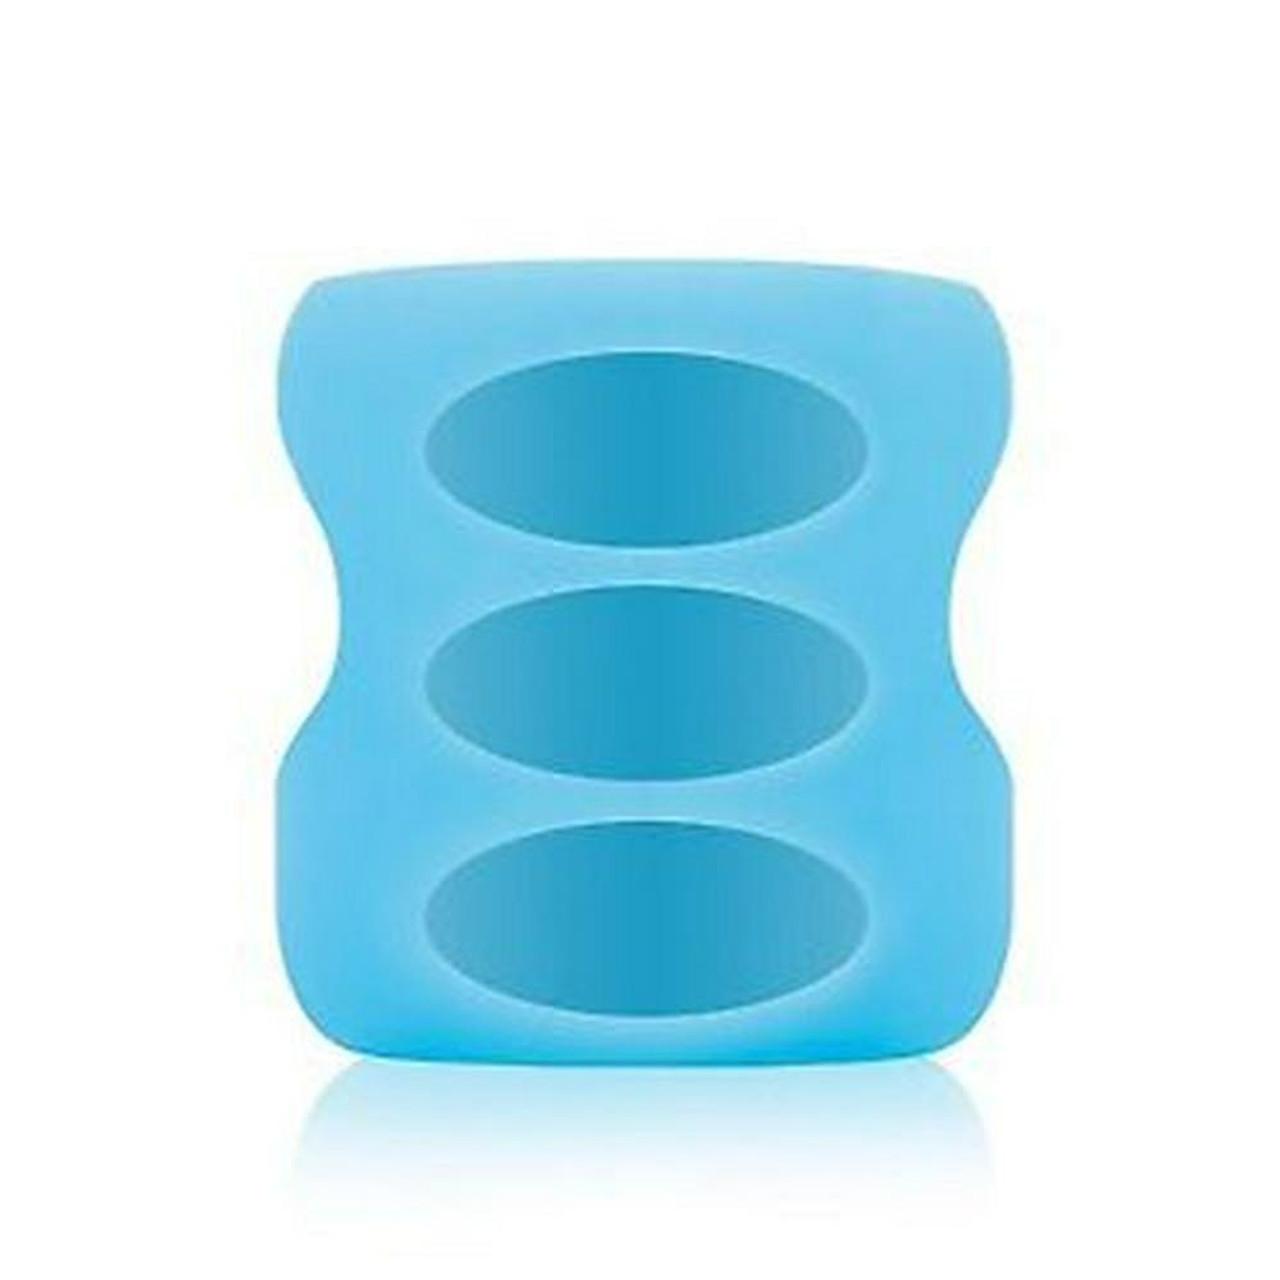 Dr Brown's Glass Bottle Sleeve for 150ml Wide Neck Bottle - BLUE